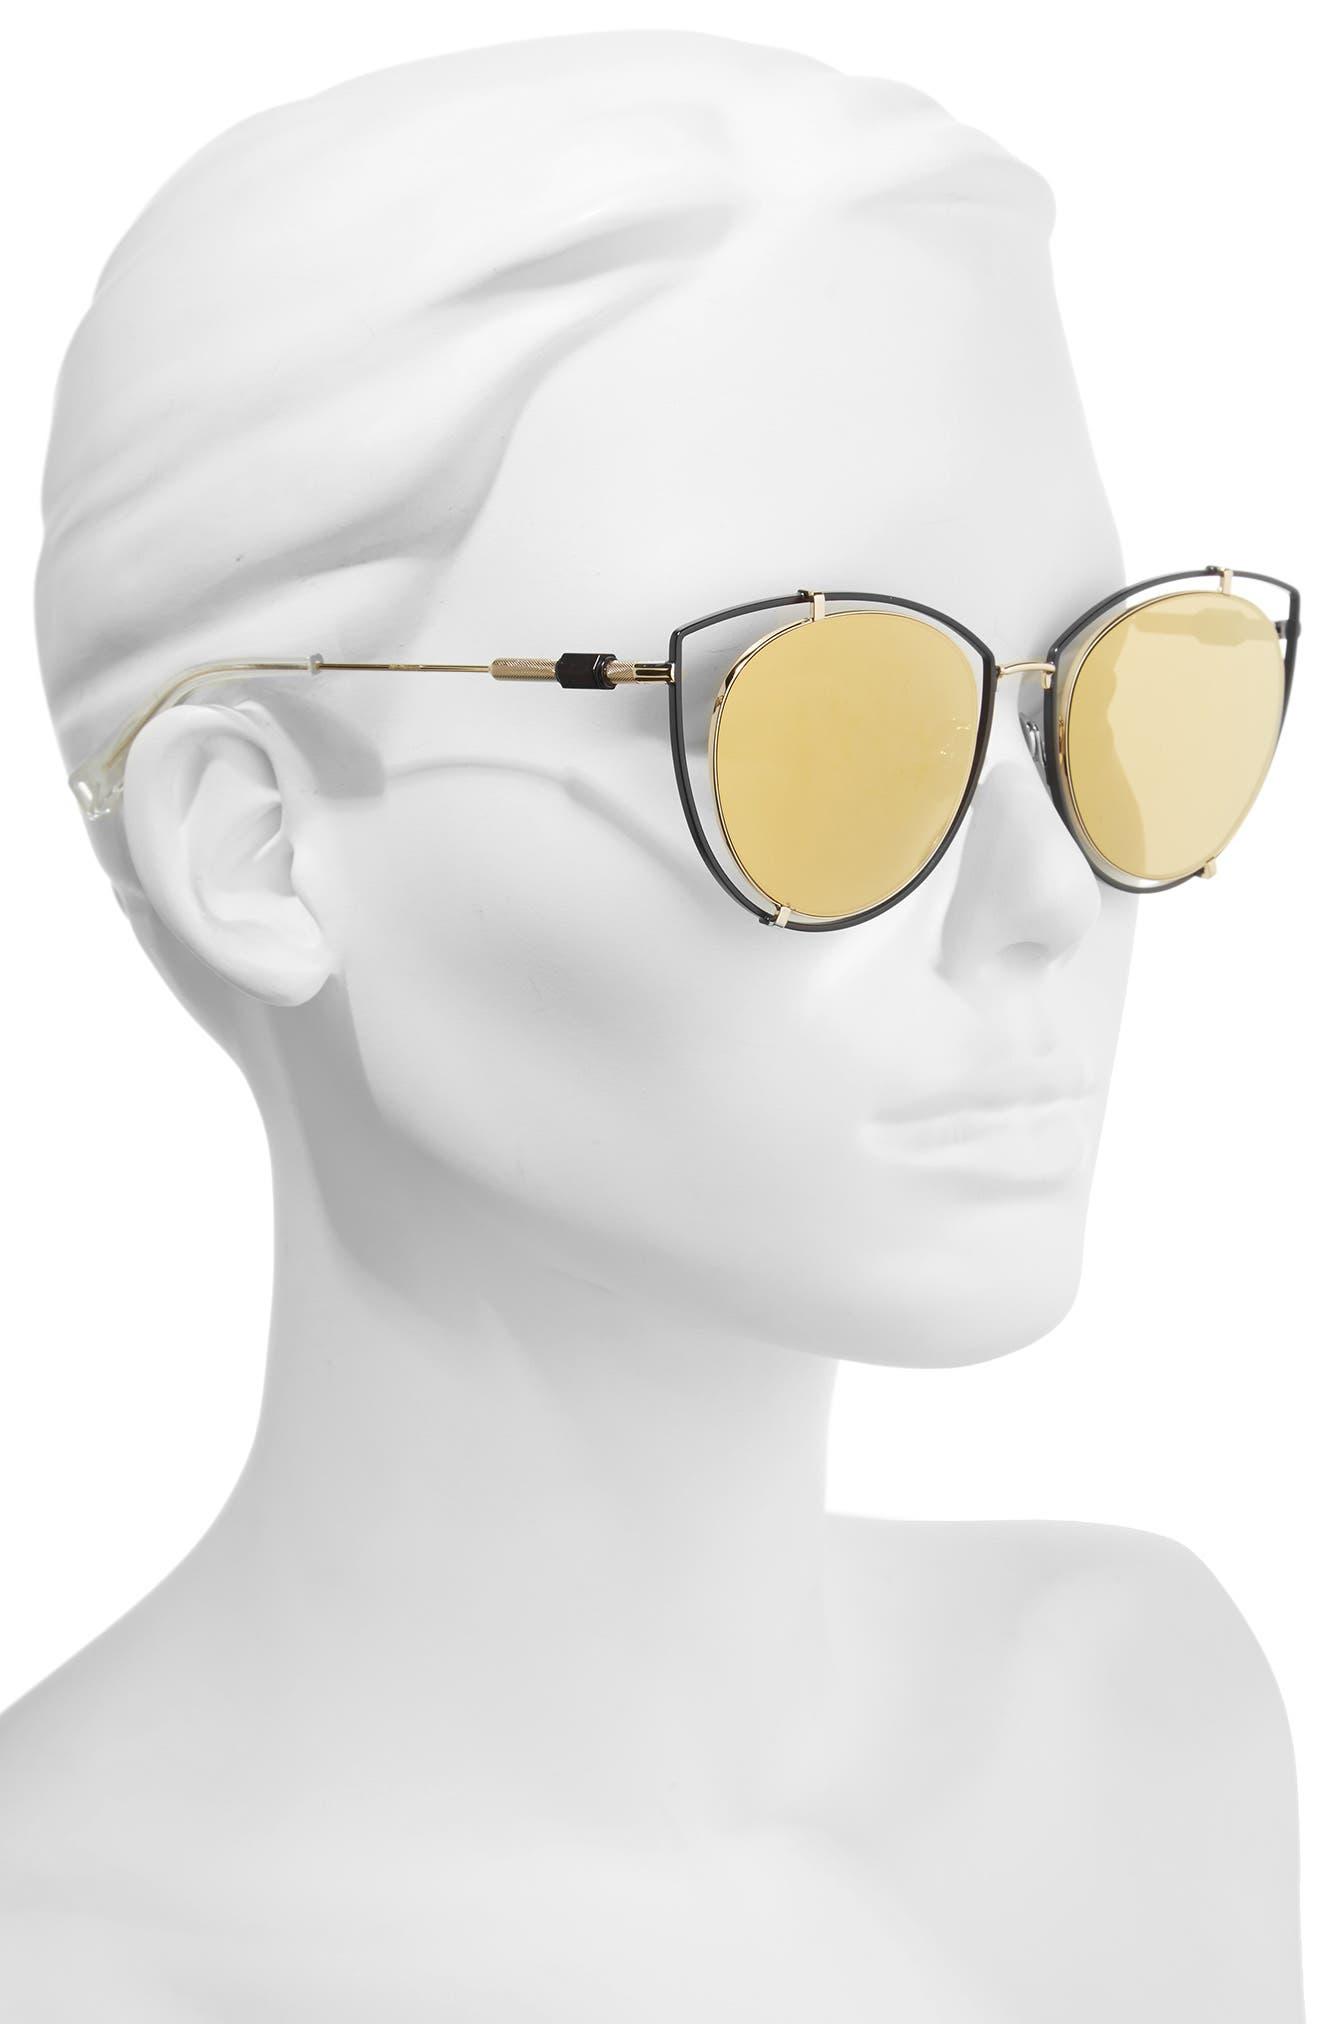 Vyt 53mm Cat Eye Sunglasses,                             Alternate thumbnail 2, color,                             001